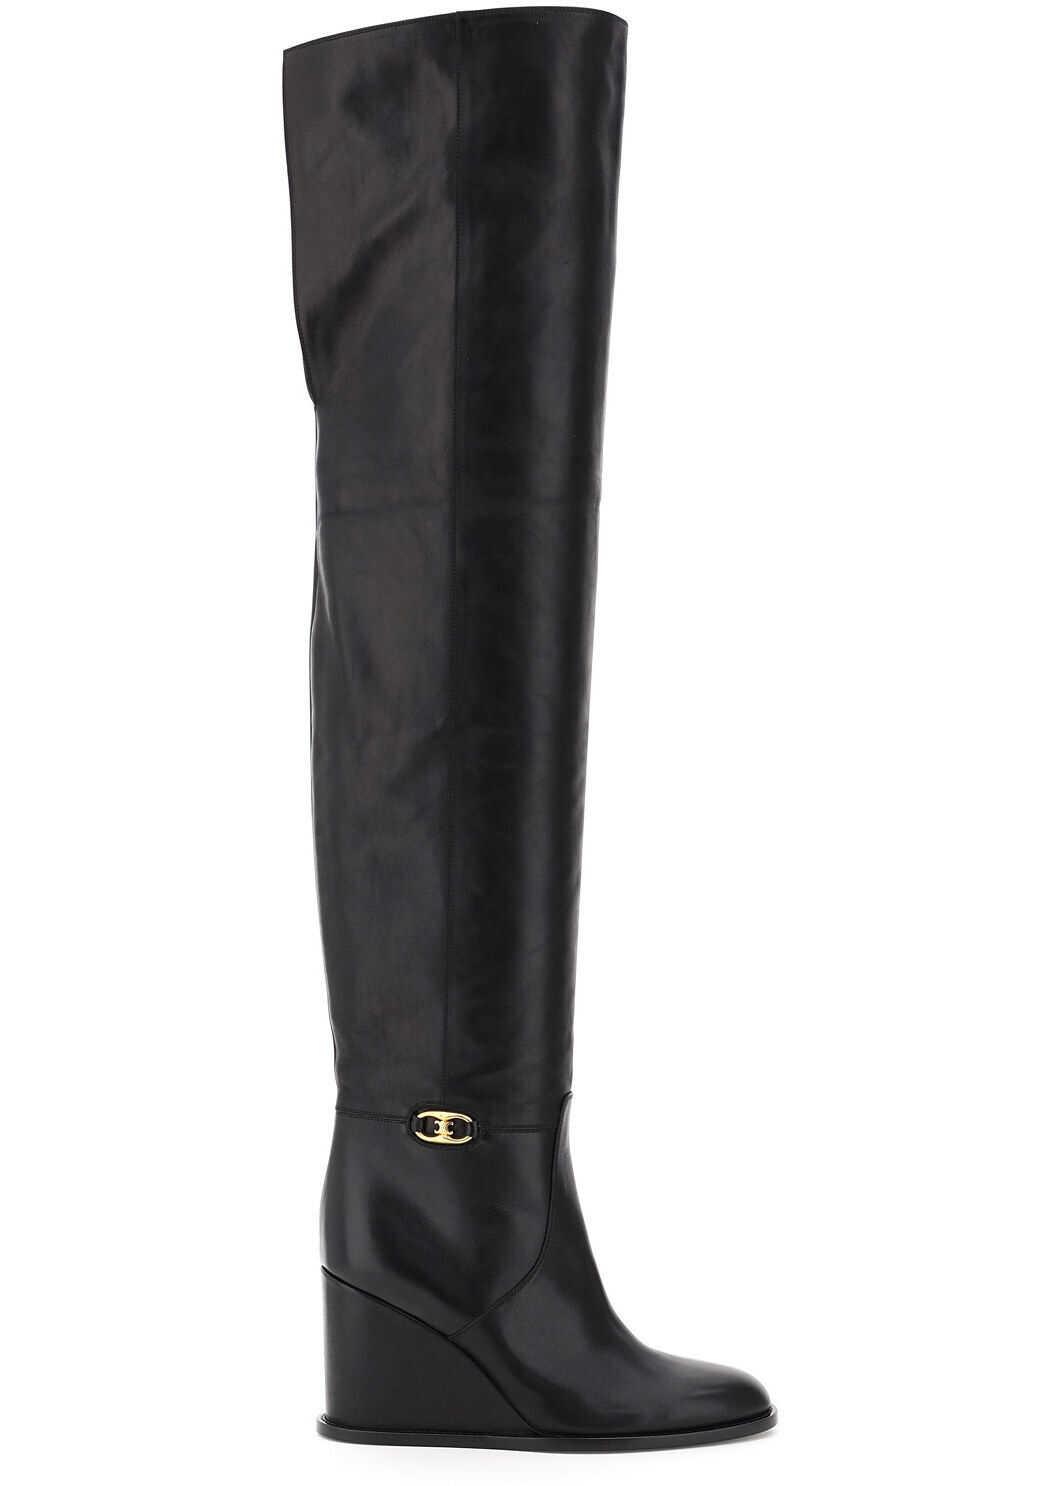 Céline Manon Over The Knee Leather Boots 339683194C BLACK imagine b-mall.ro